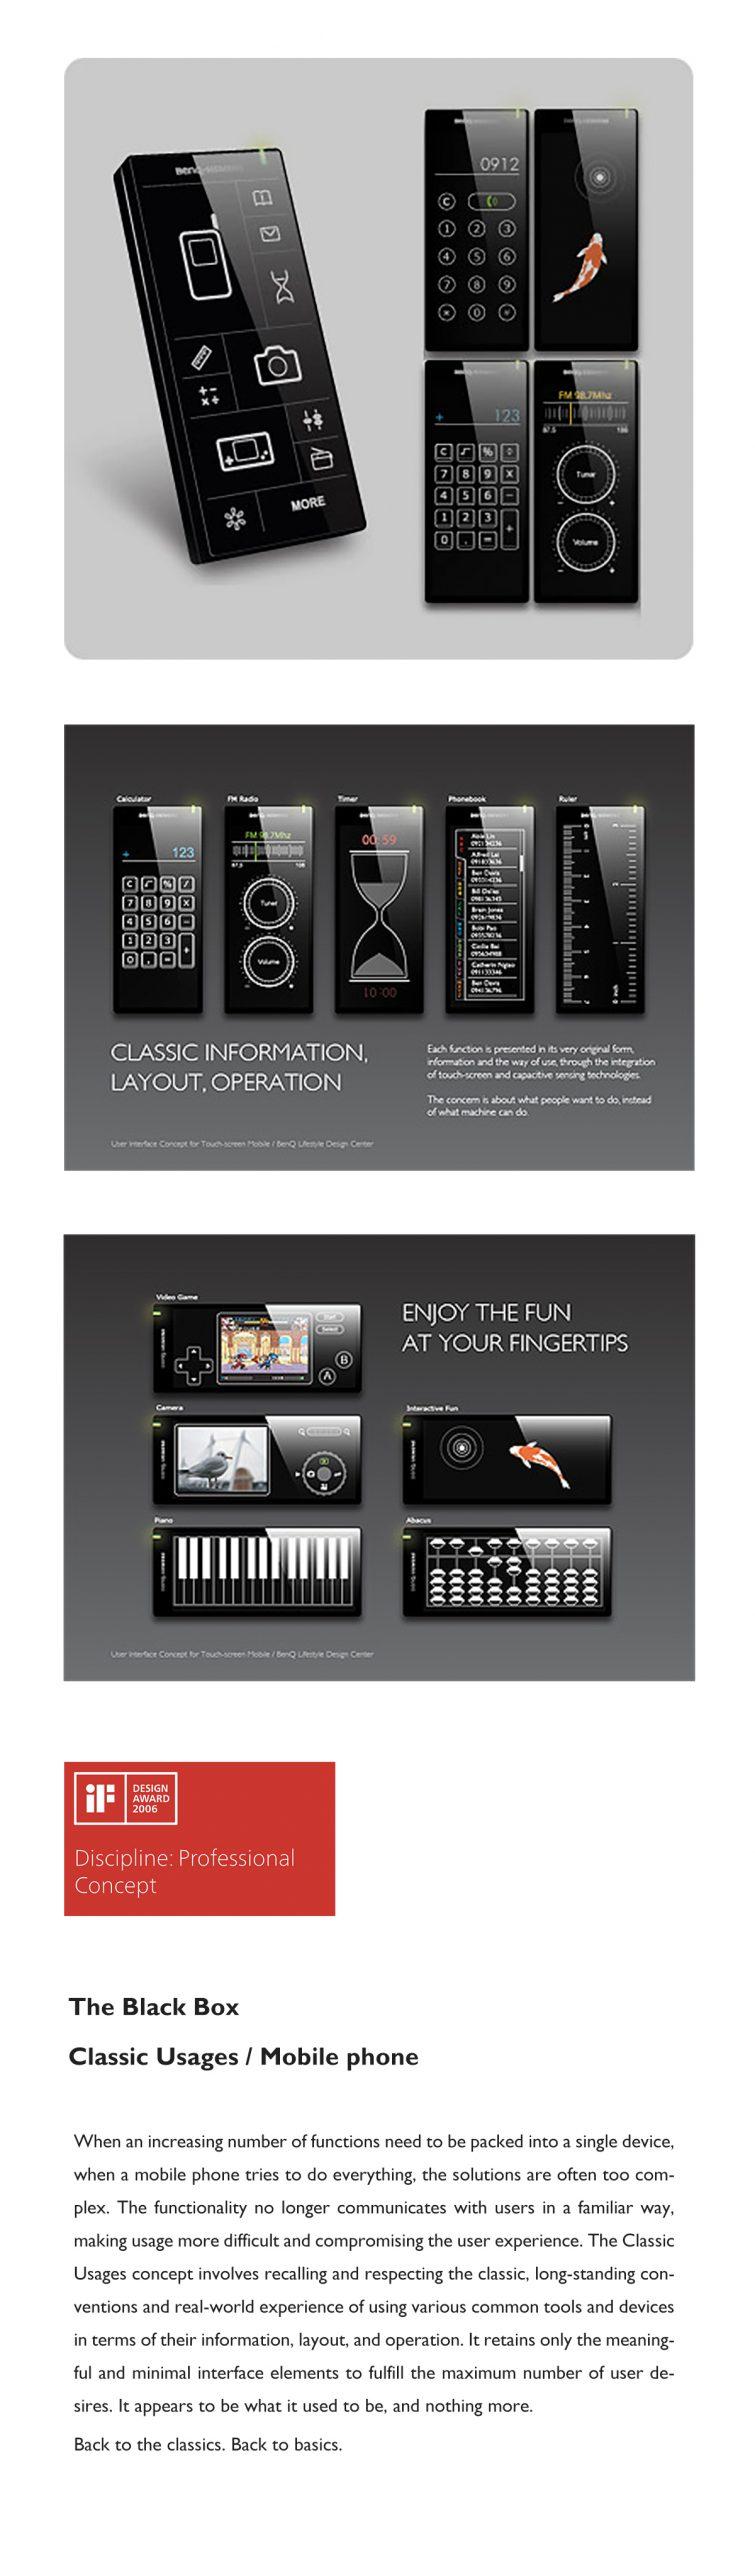 BenQ Black Box概念手机获颁2006 iF Design Award设计大奖